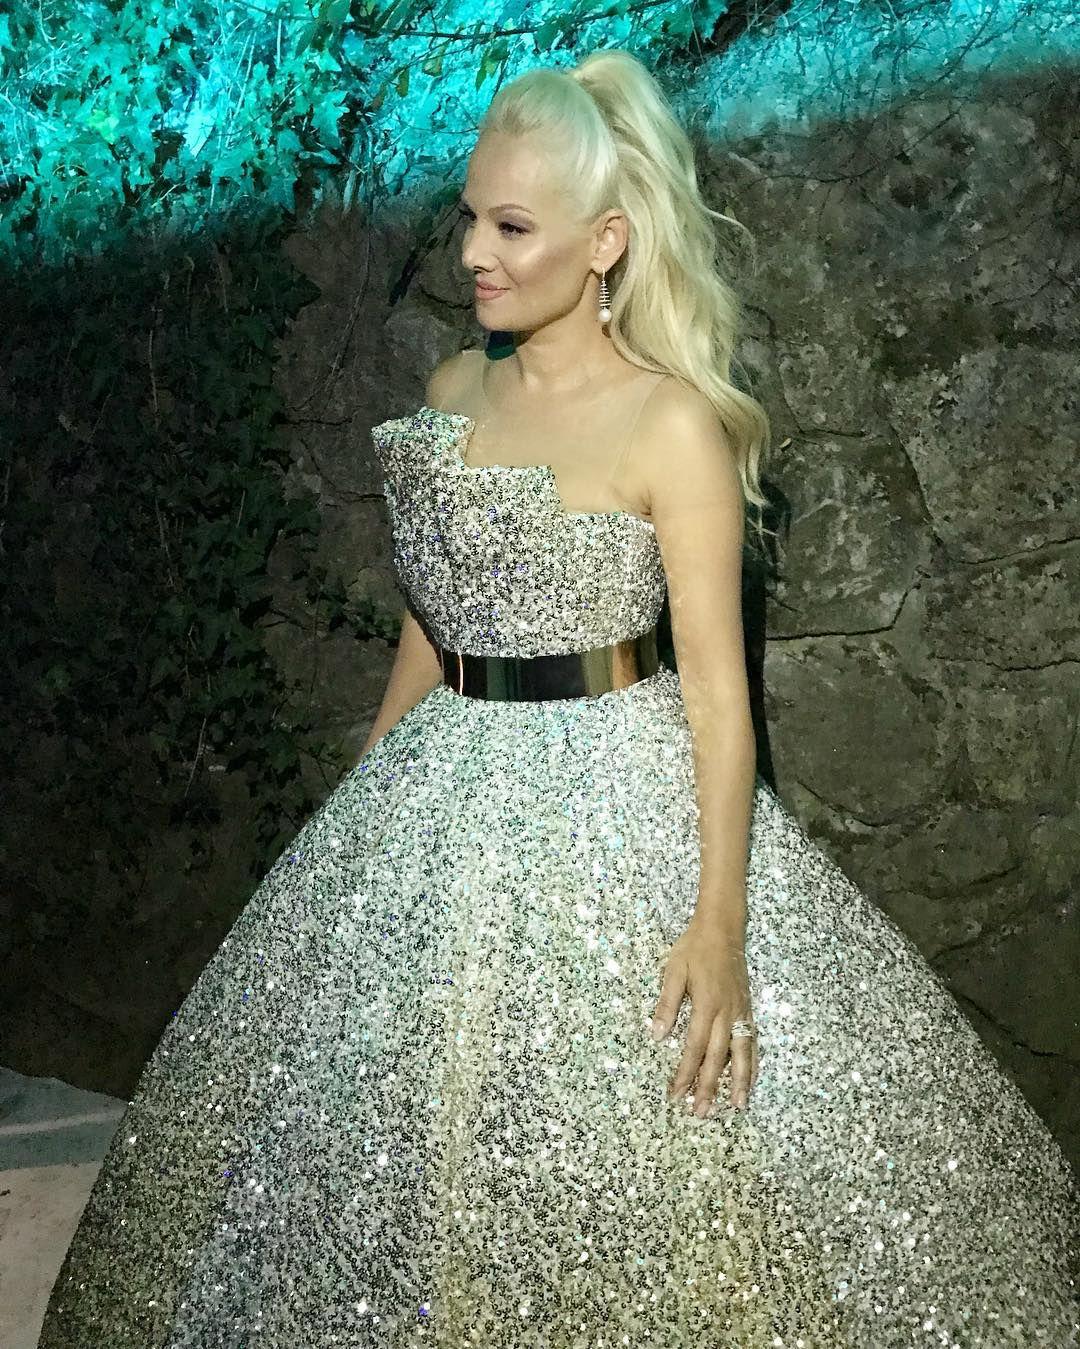 Srpska pjevačica zaludila Instagram fantastičnom svjetlucavom haljinom